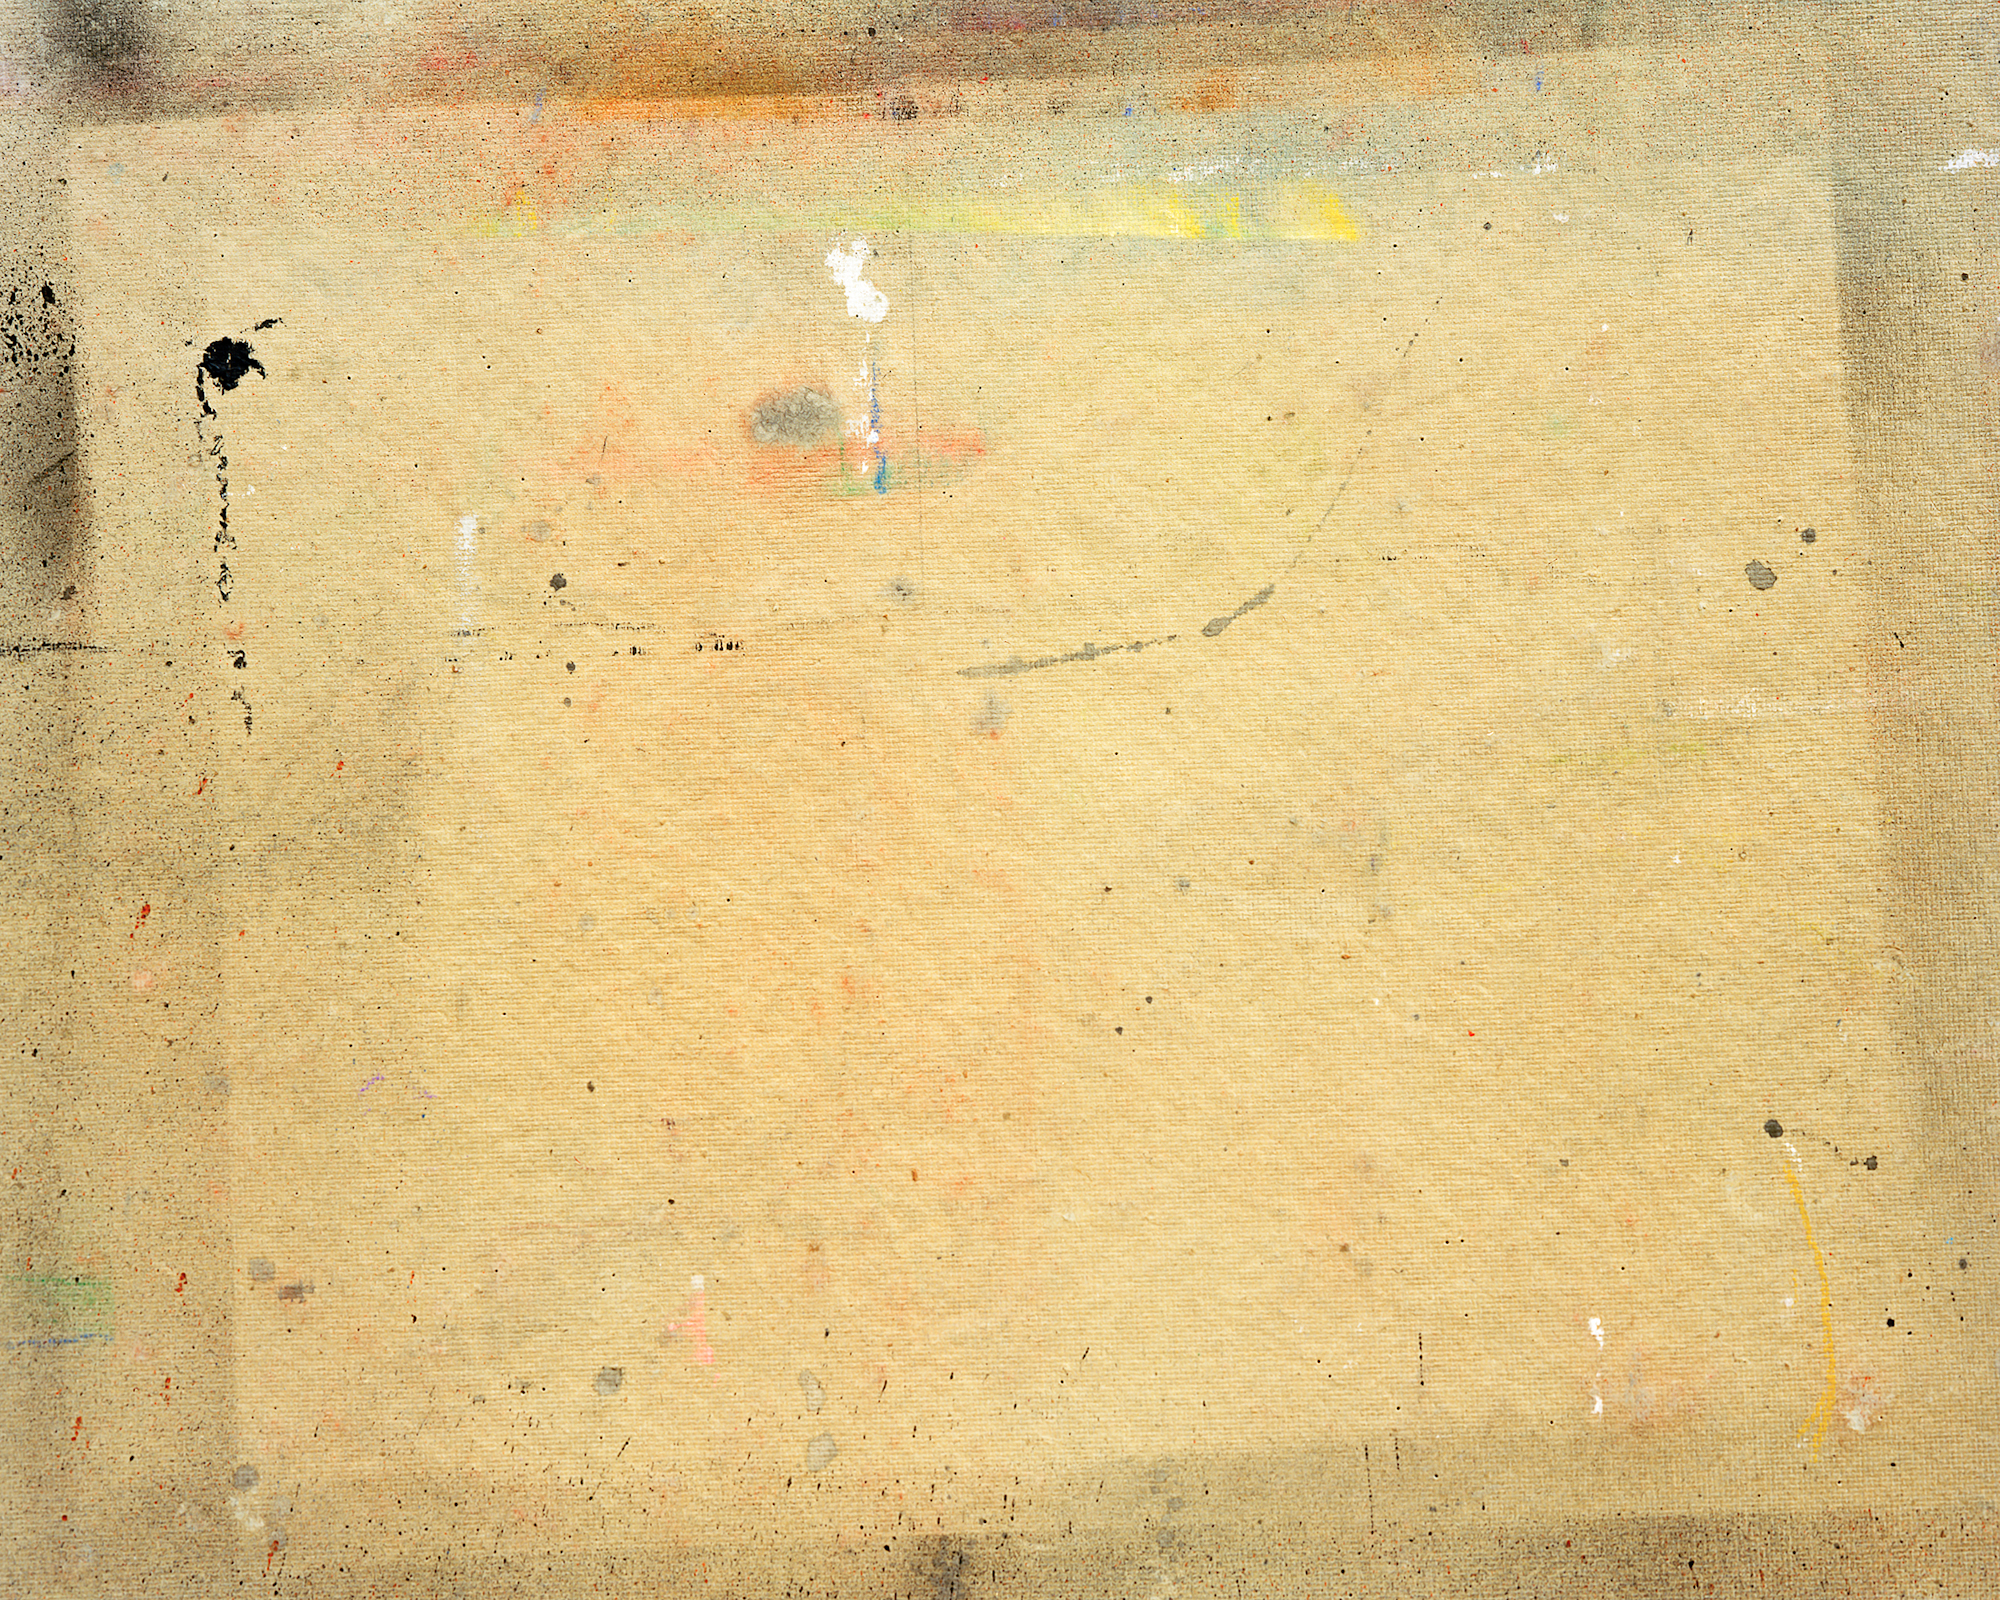 Studio-1, archival pigment print,11 x 14 inches, 2013